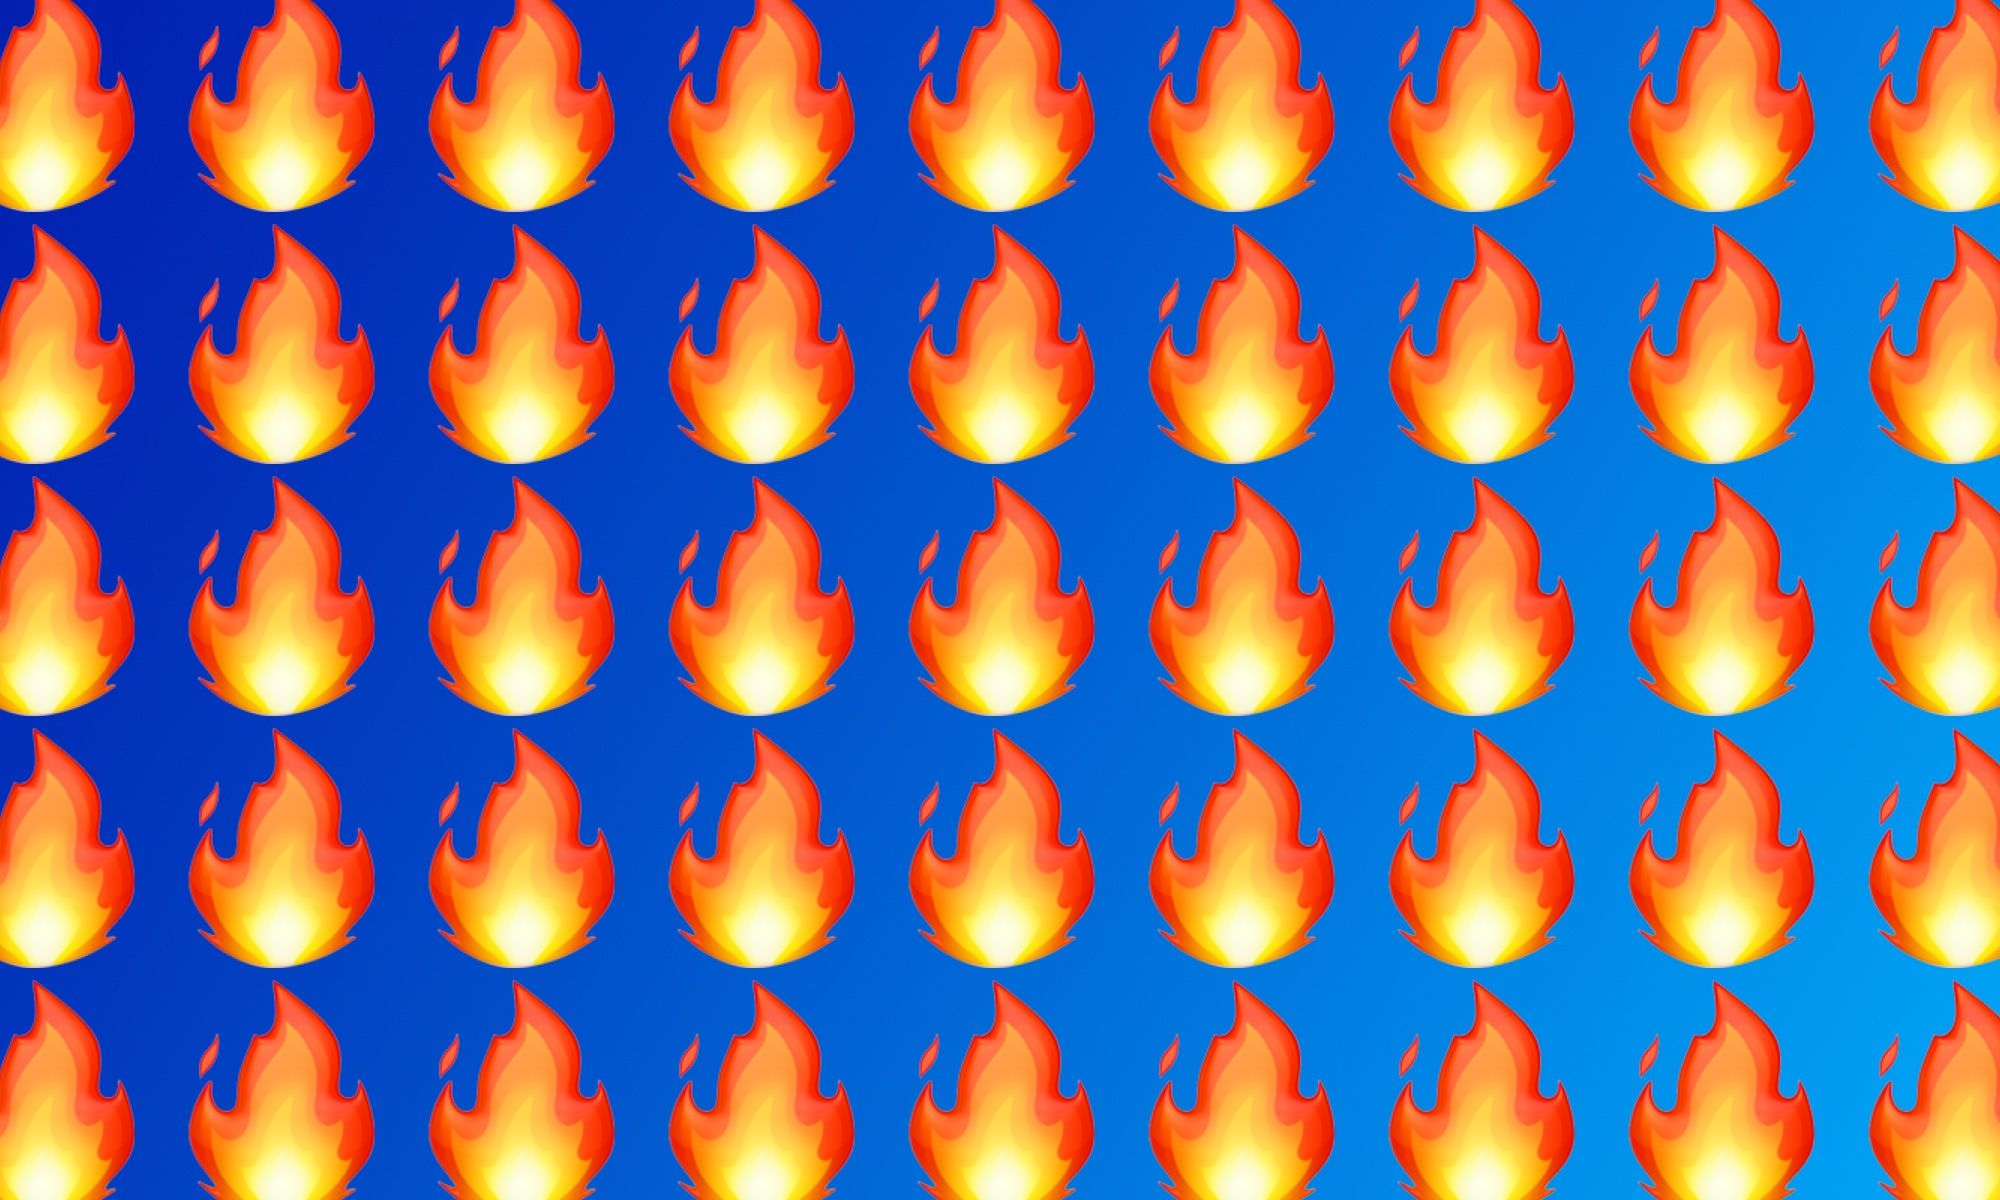 Emojiology: 🔥 Fire